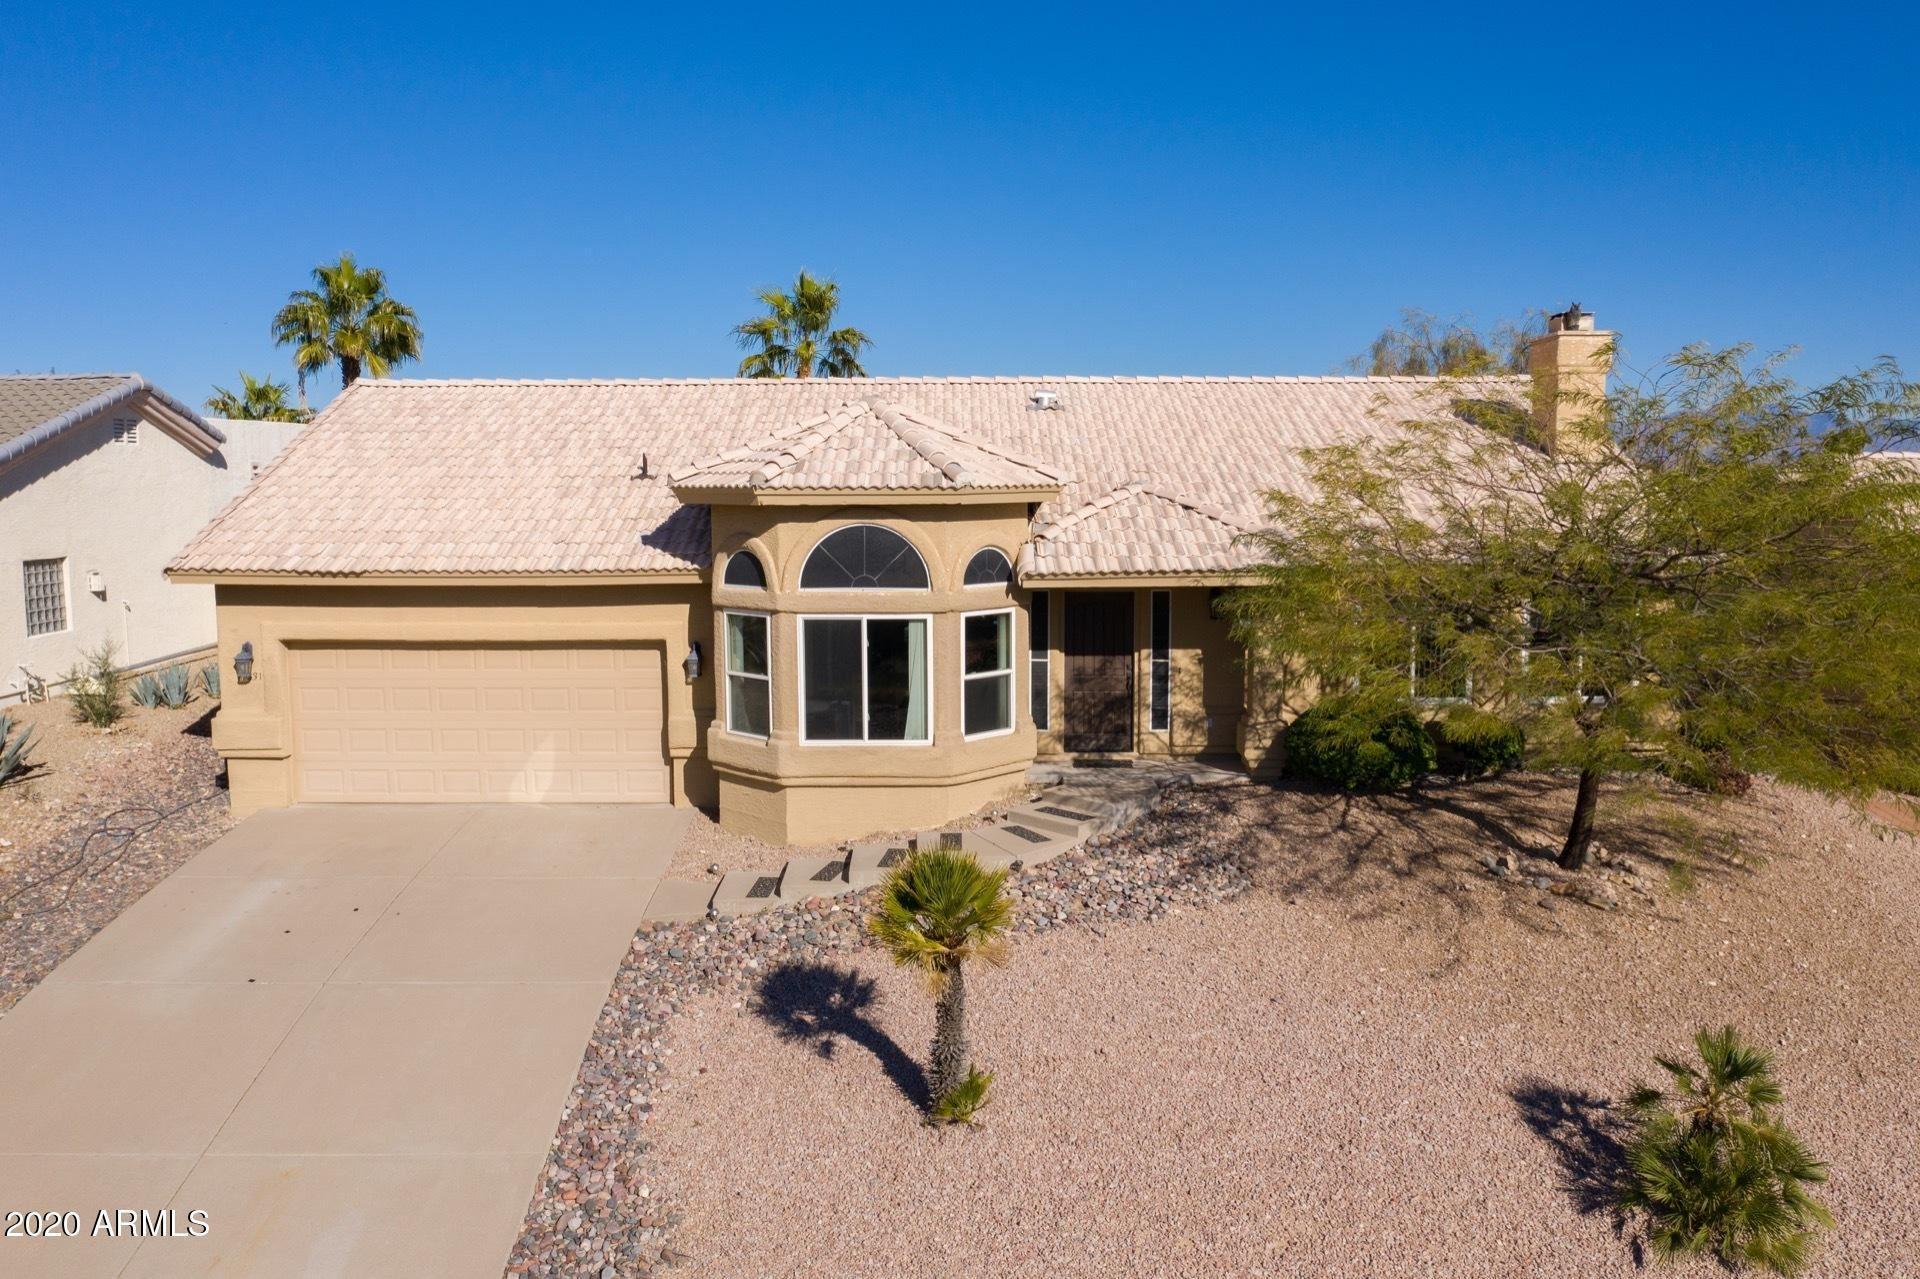 11031 N BUFFALO Drive, Fountain Hills, AZ 85268 - MLS#: 6173767